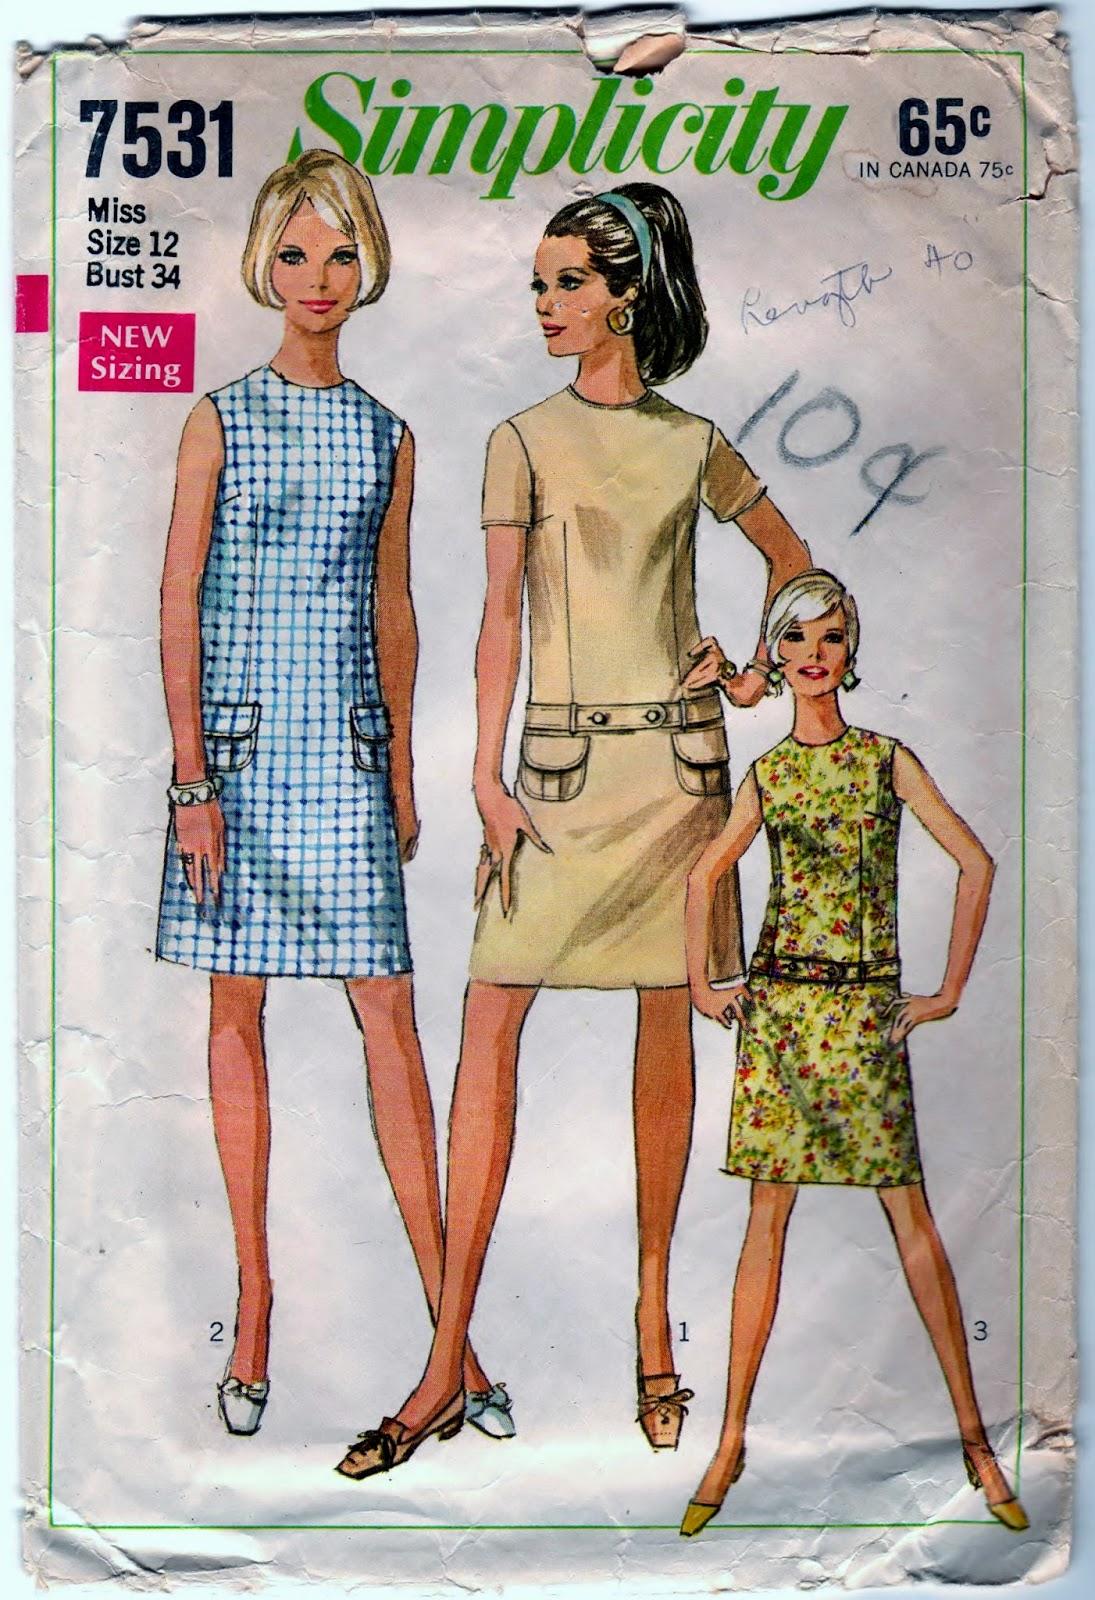 https://www.etsy.com/listing/119047289/misses-dress-size-12-bust-34-cut?ref=shop_home_home_active_9